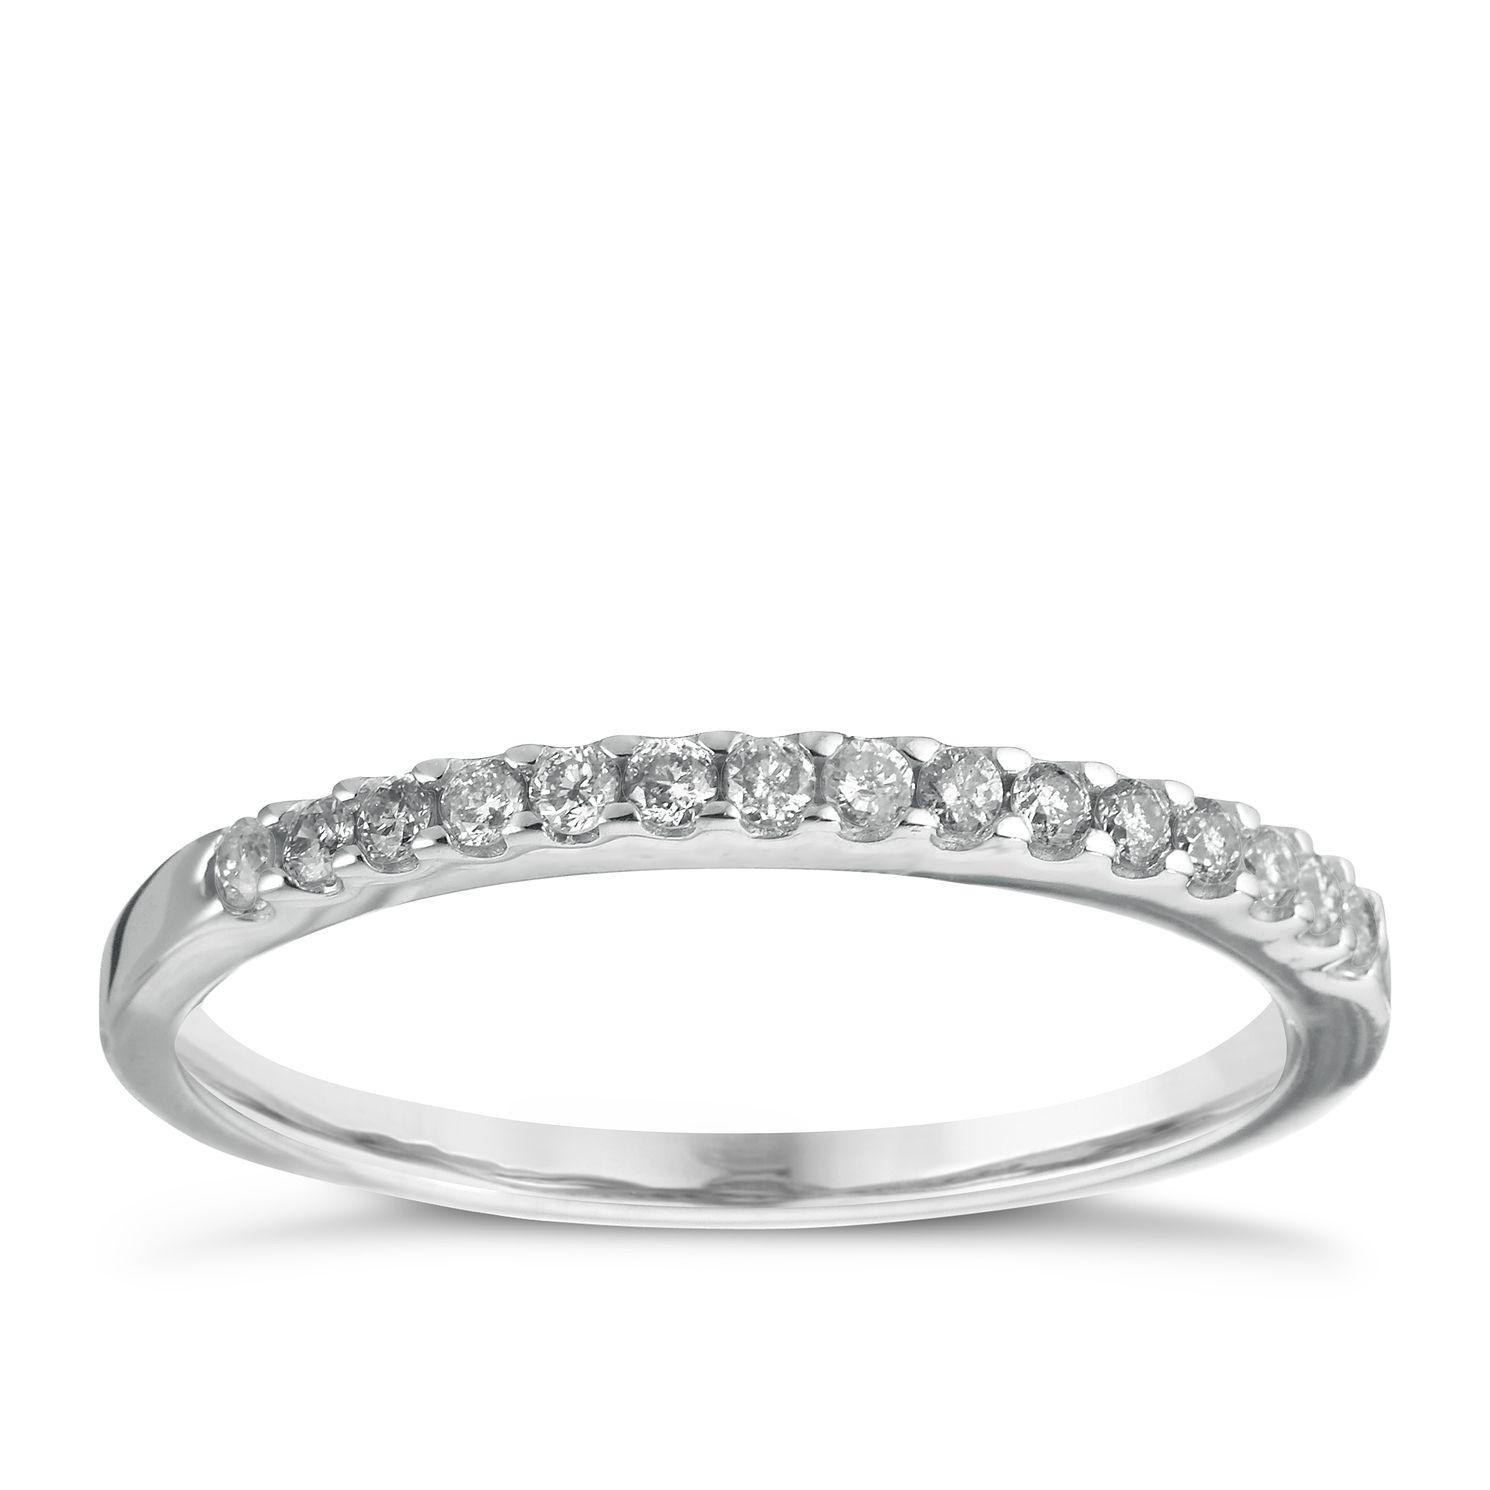 wedding rings - gold, platinum, silver & titanium wedding rings